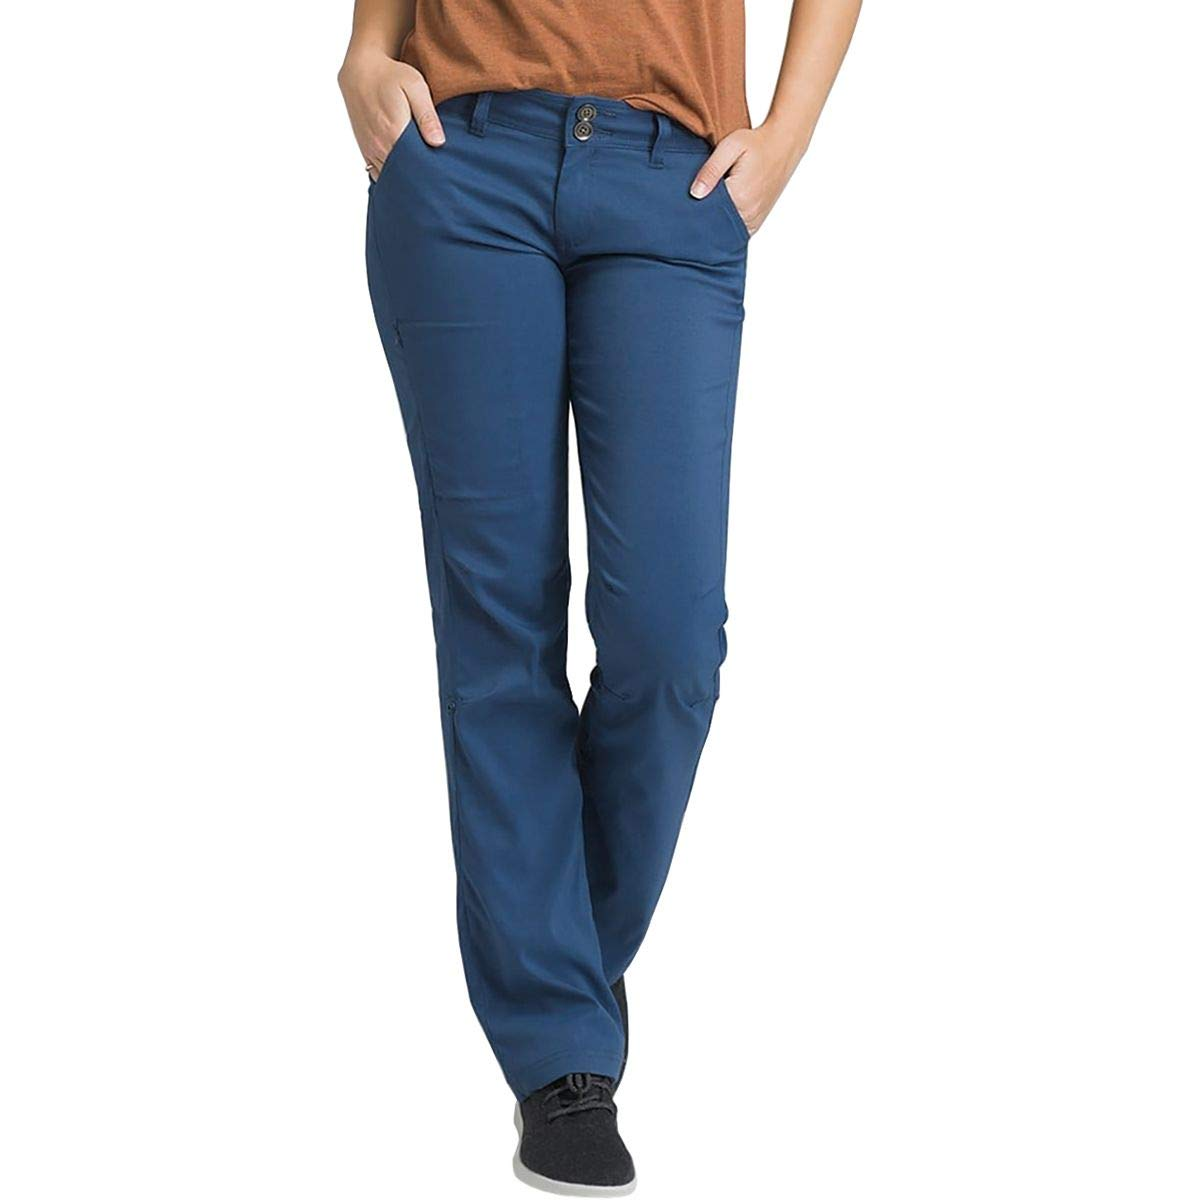 prAna Women's Regular Inseam Halle Pants, 0, Equinox Blue